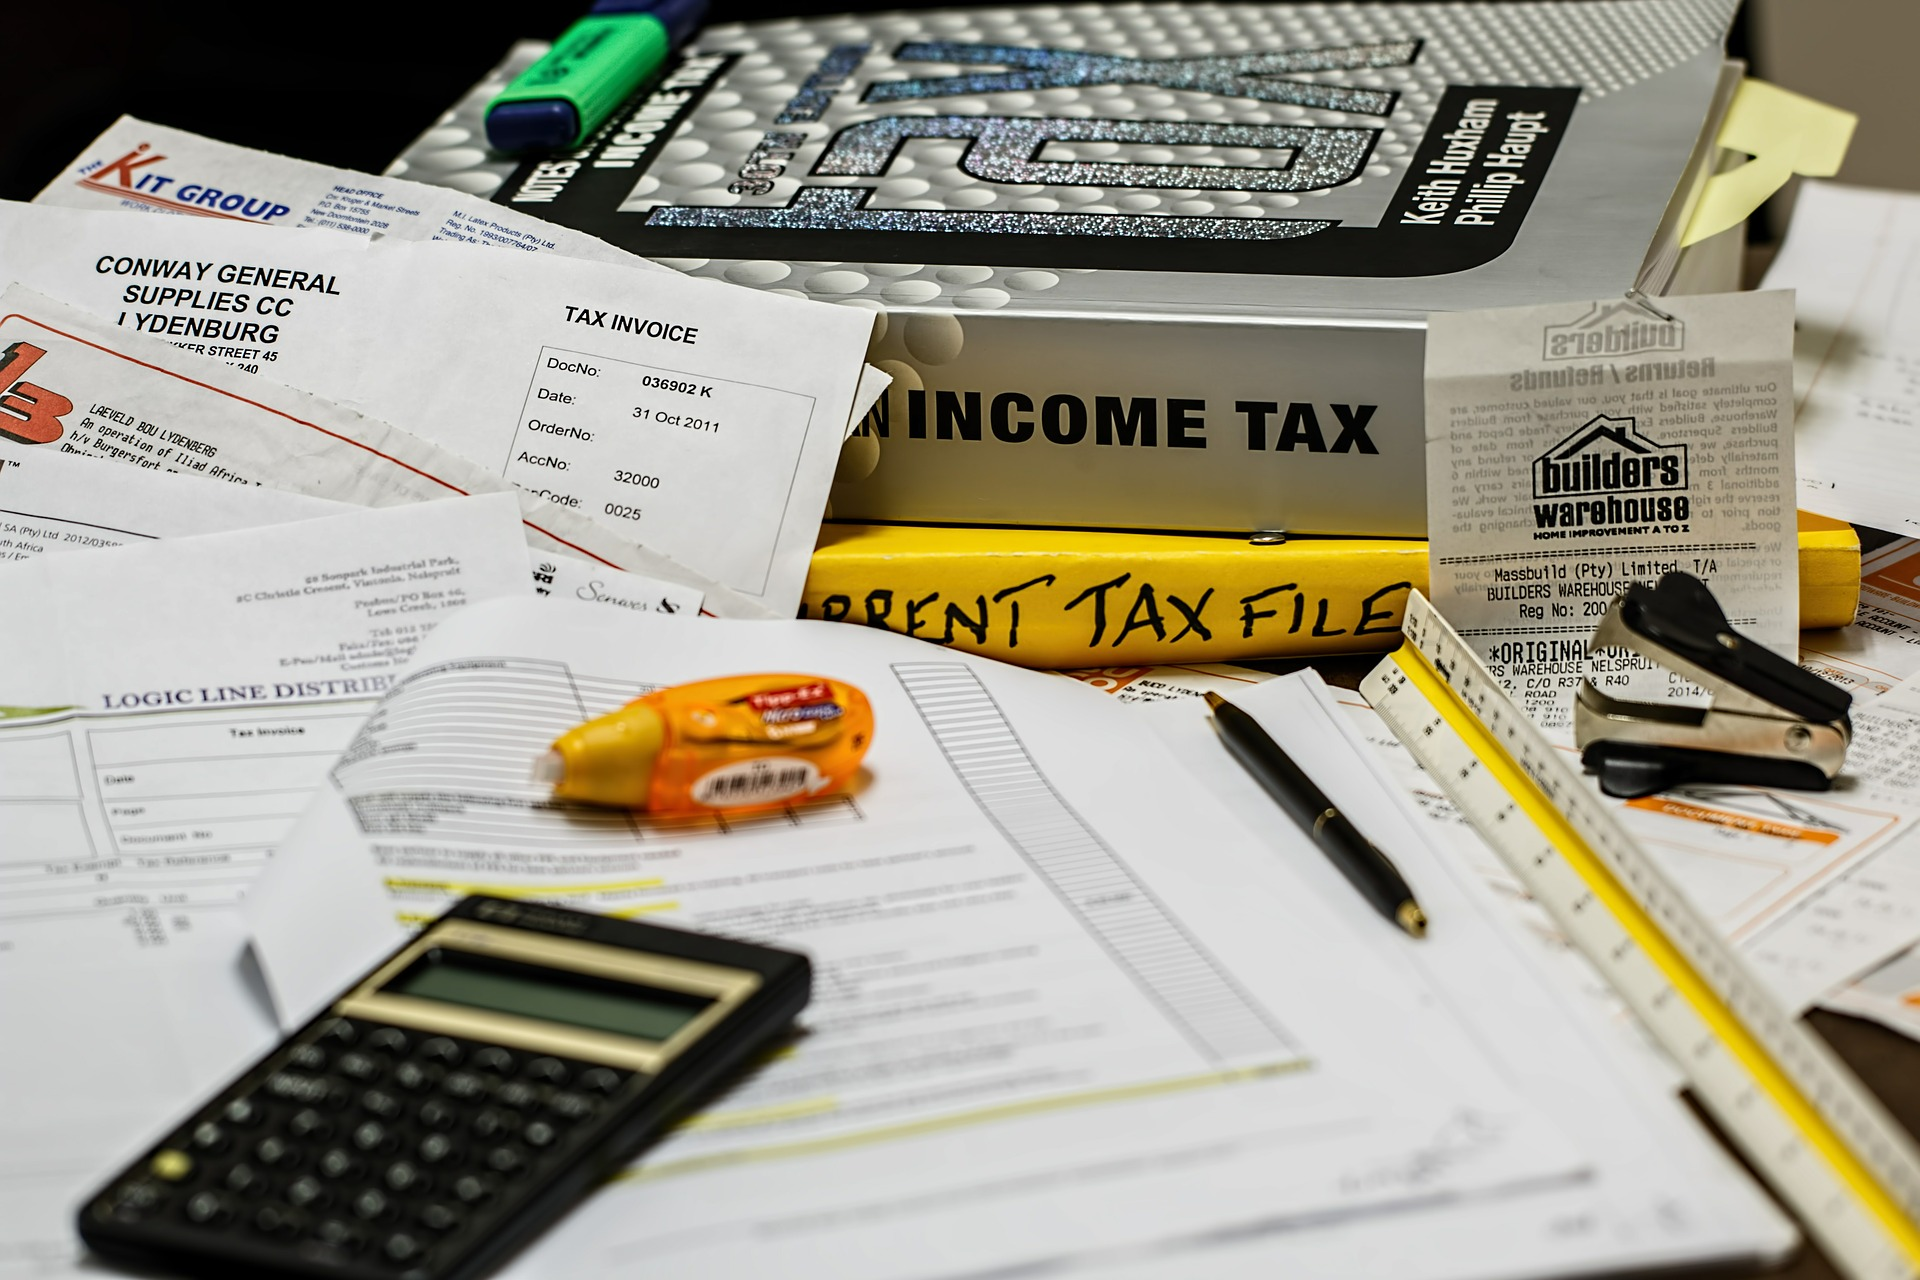 Tax & Financial image 8